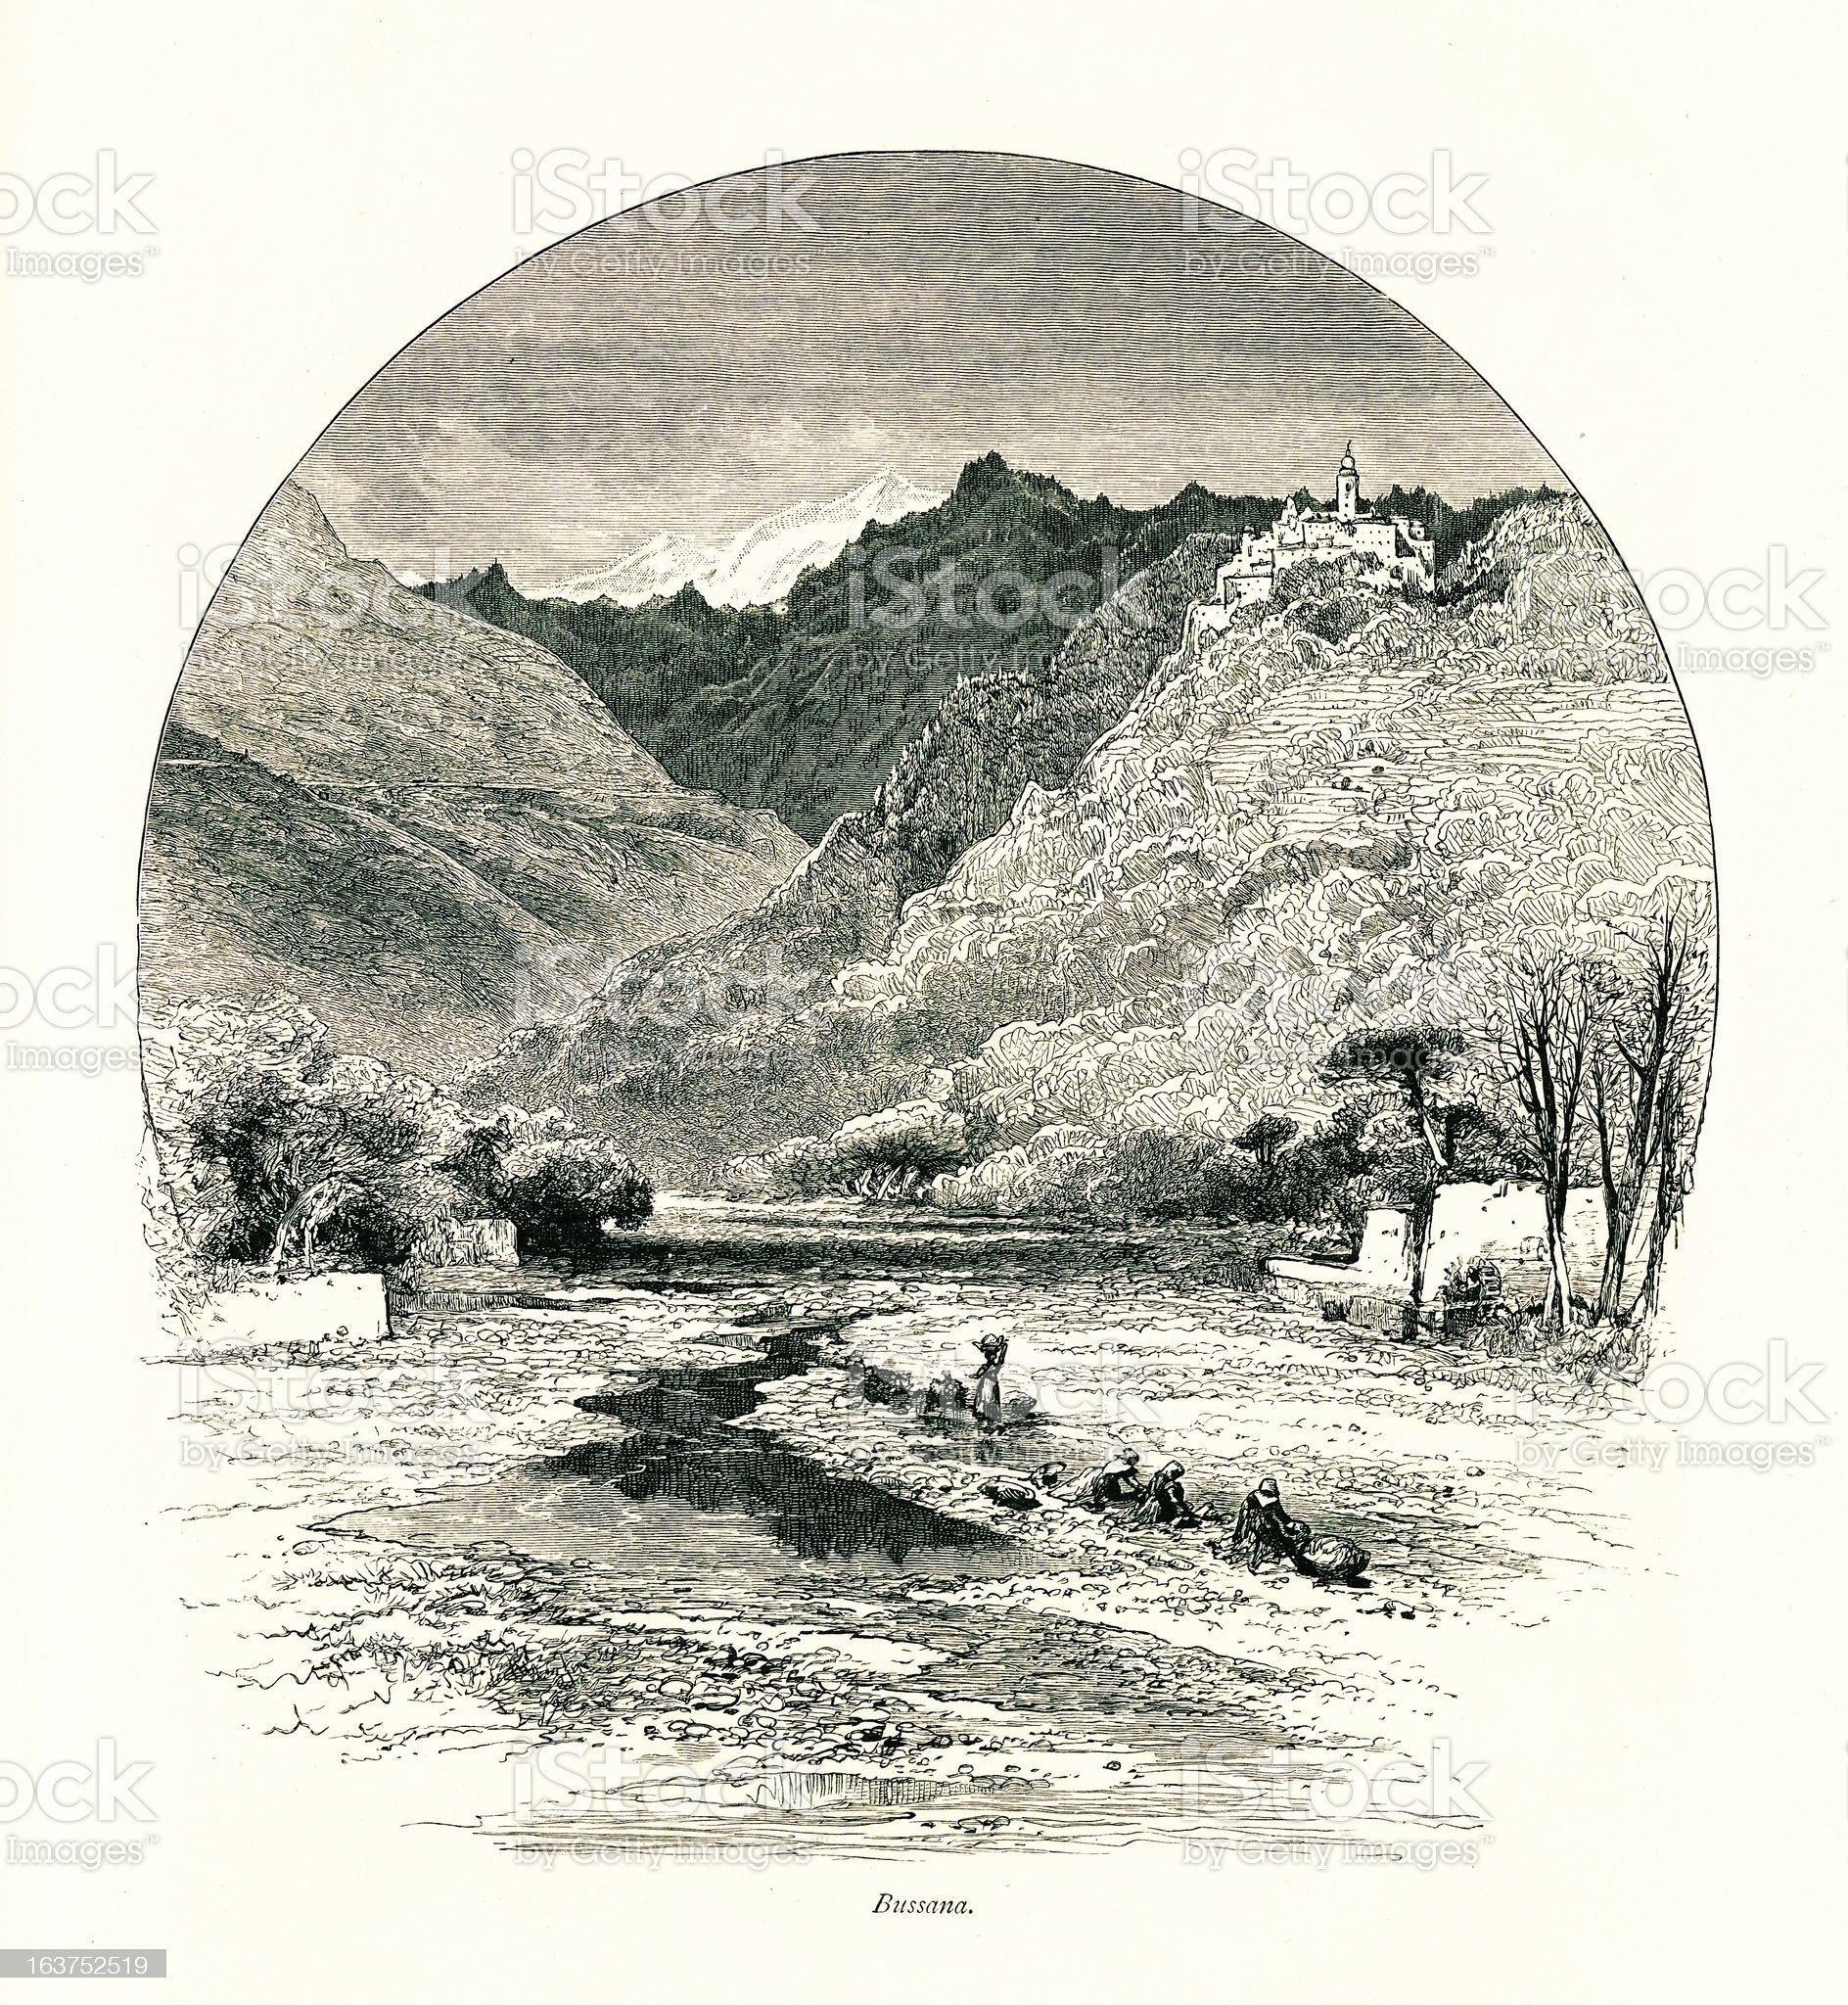 Bussana Vecchia, Italy I Antique European Illustrations royalty-free stock vector art